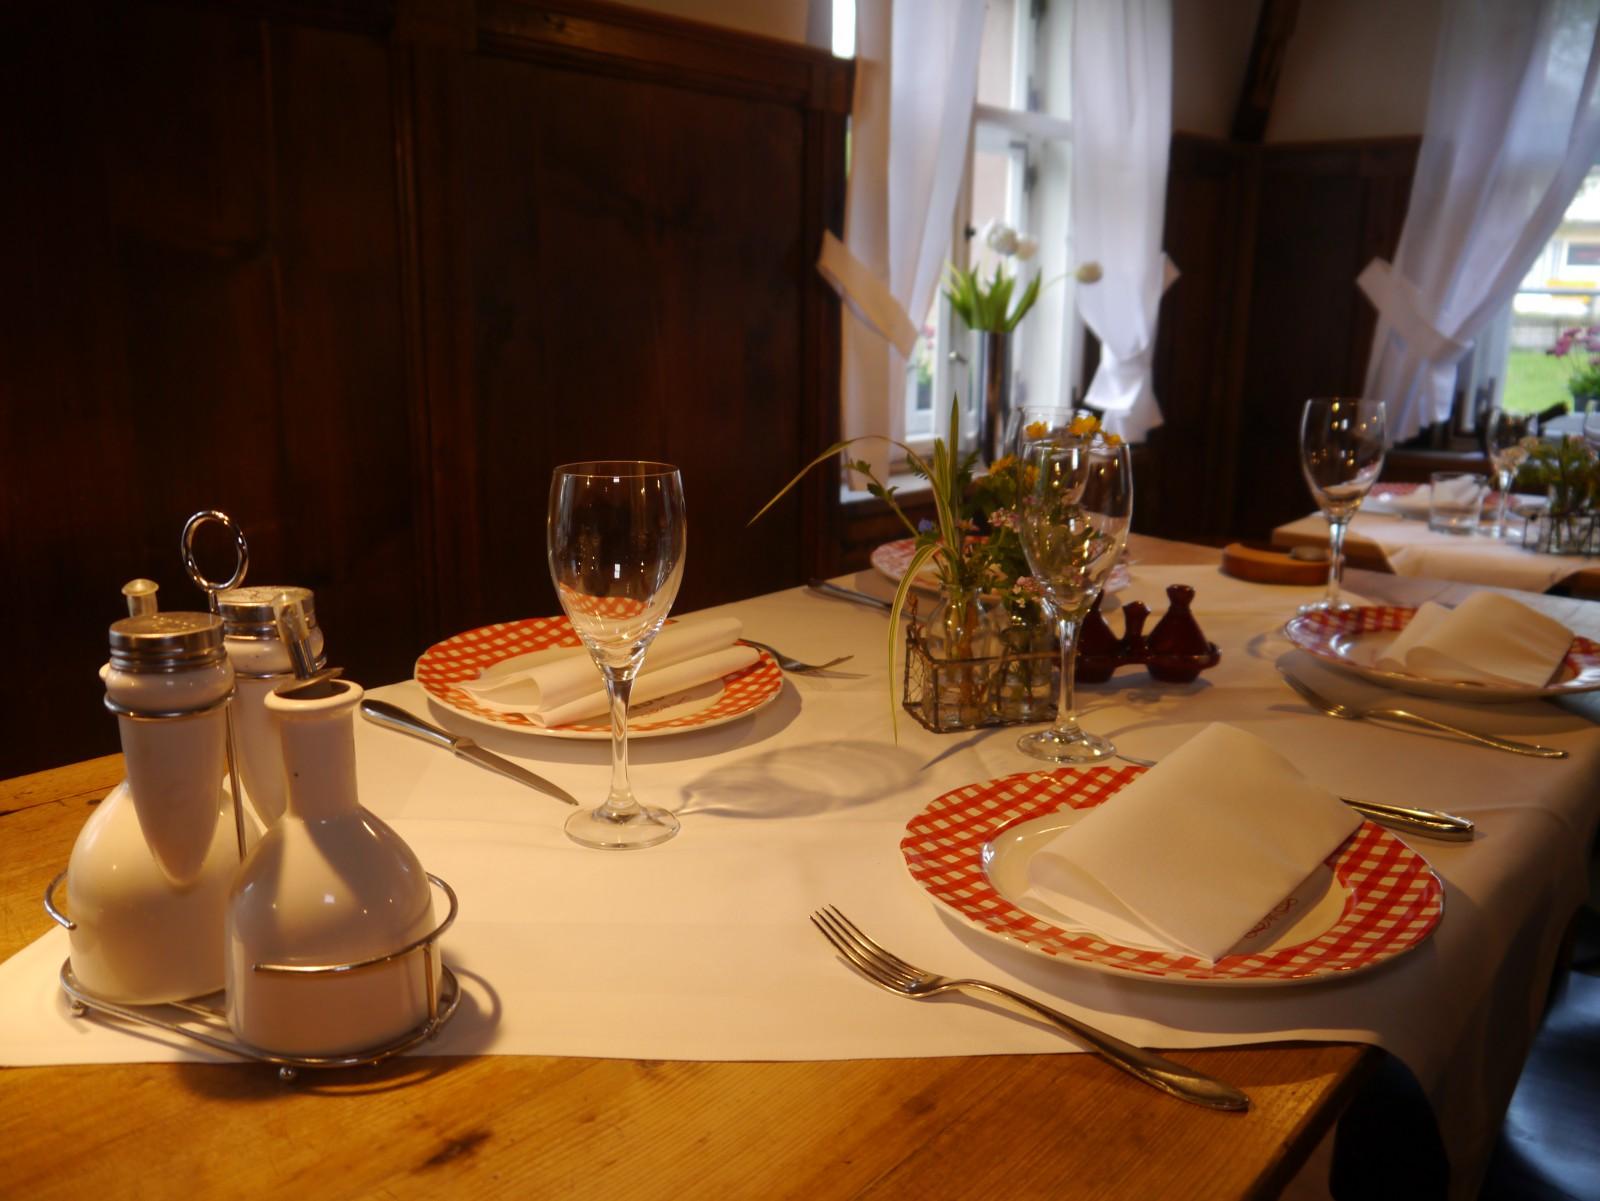 Martines Le petit Restaurant in Deißlingen